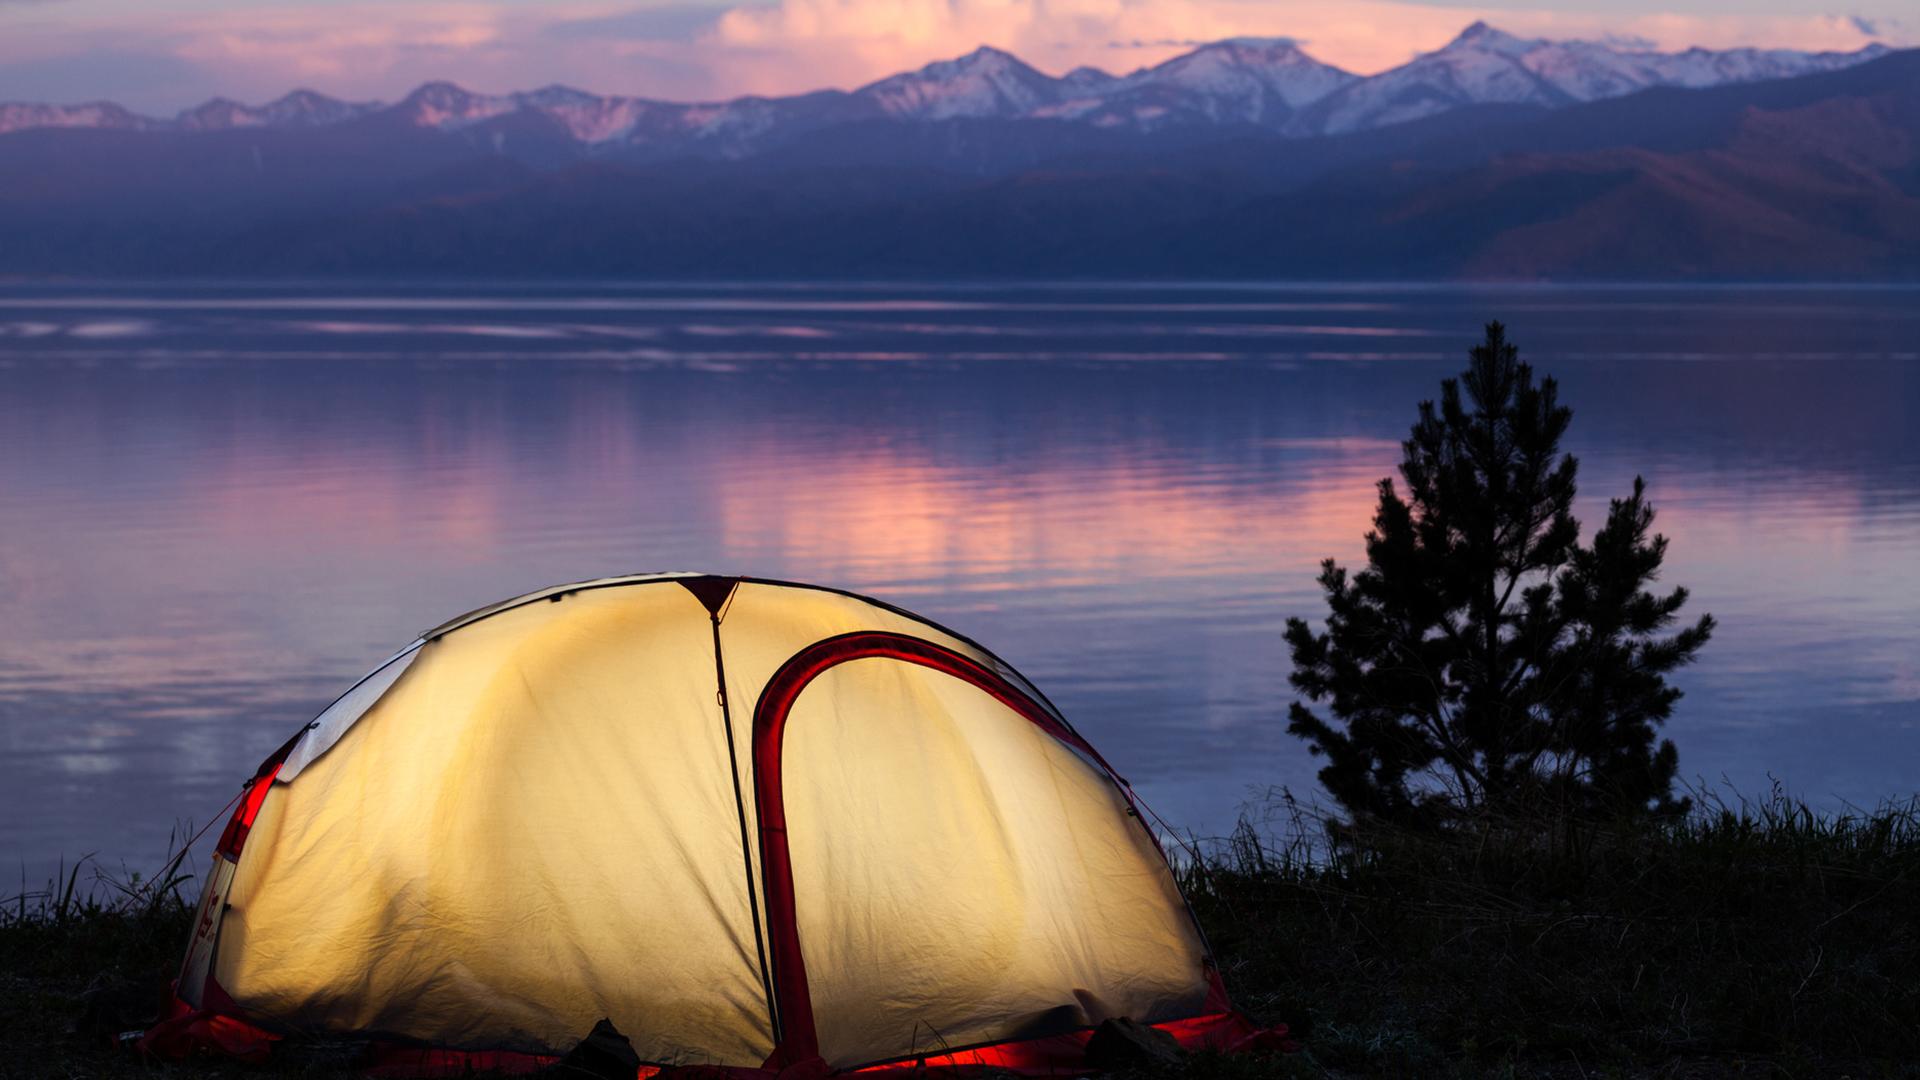 039076038-tent-across-beautiful-sunset-l.jpg